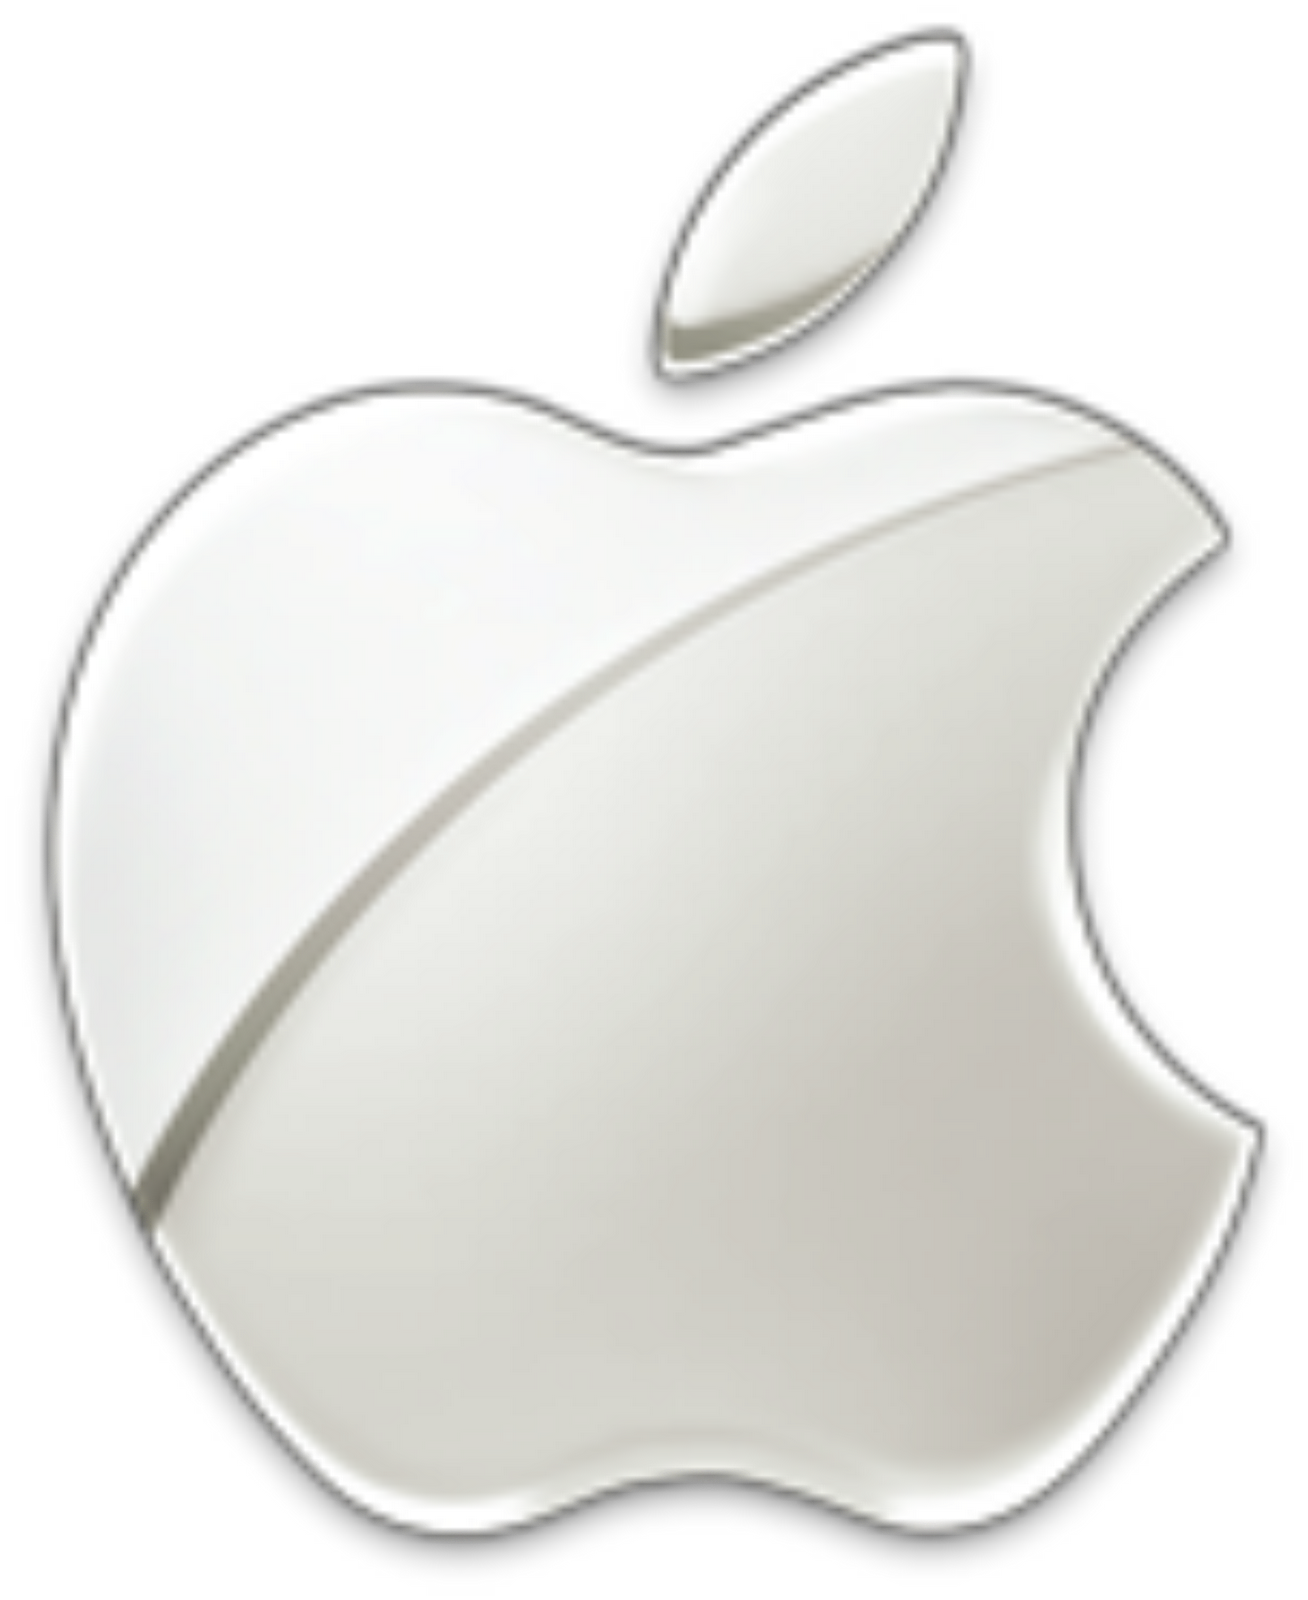 Apple Logo Png Transparent Background | www.imgkid.com ...